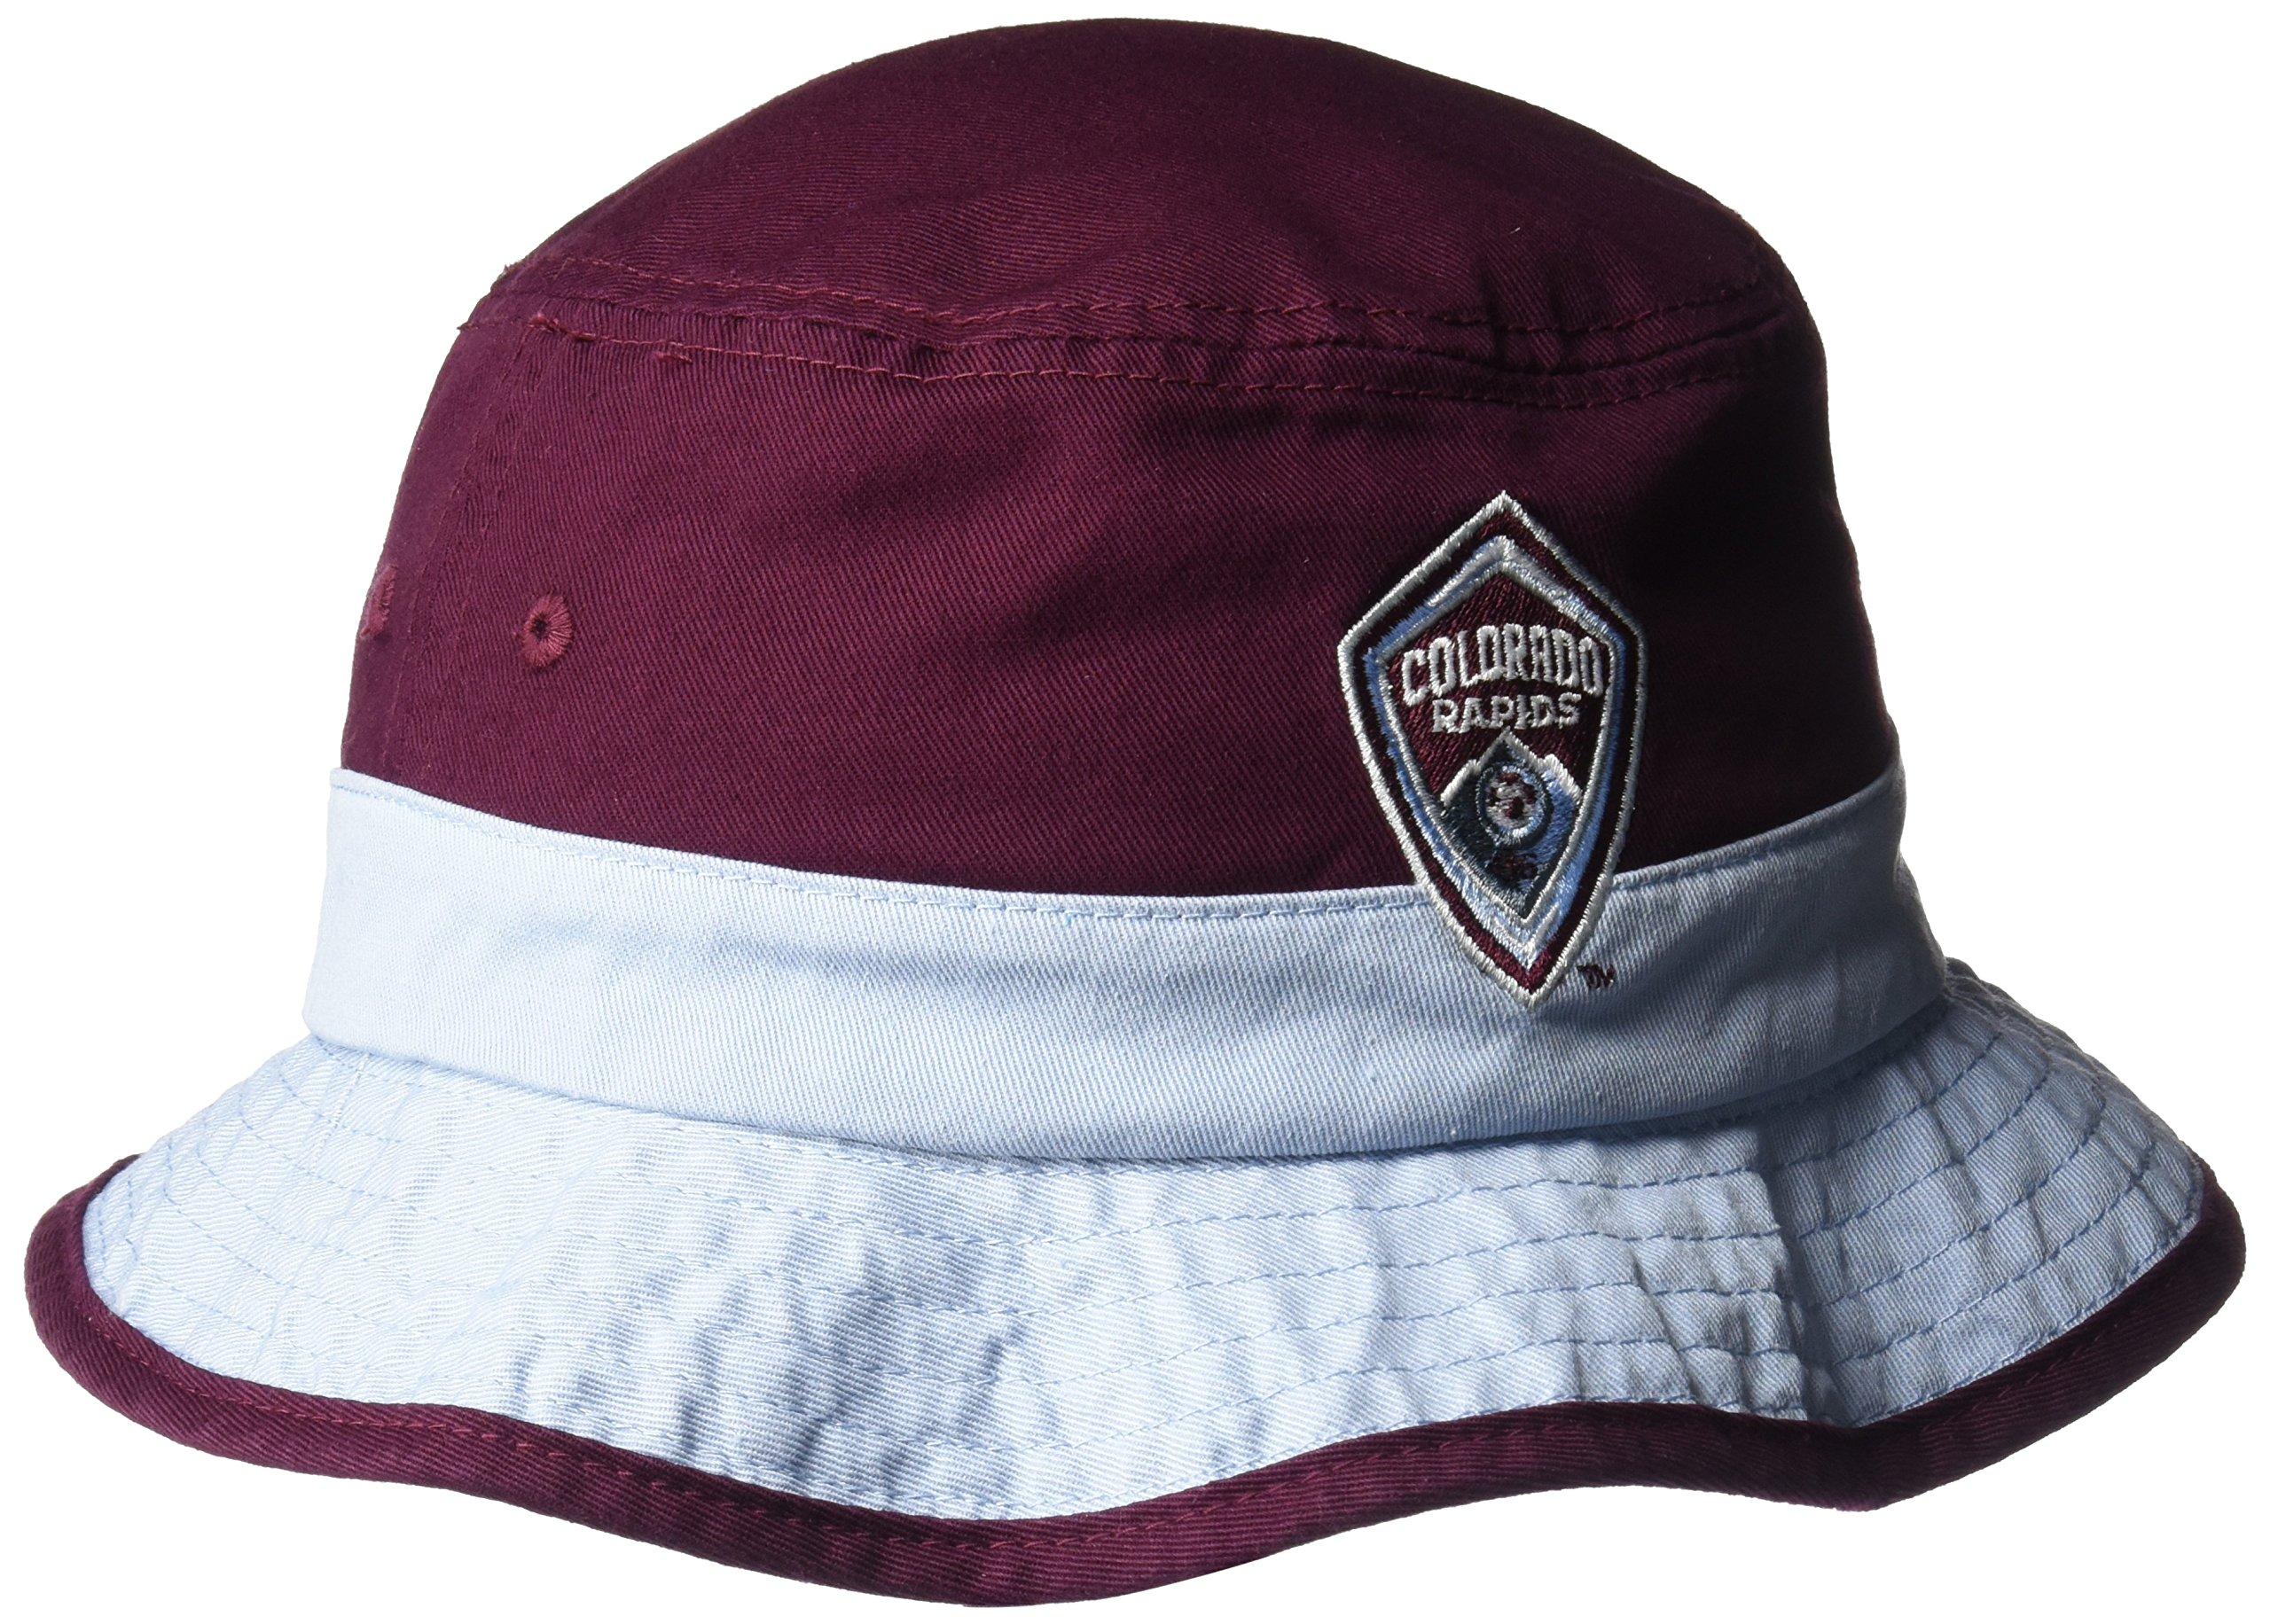 89f56fb184ebee Galleon - NBA Cleveland Cavaliers Unisex Team Bucket Hat, Burgundy,  Small/Medium